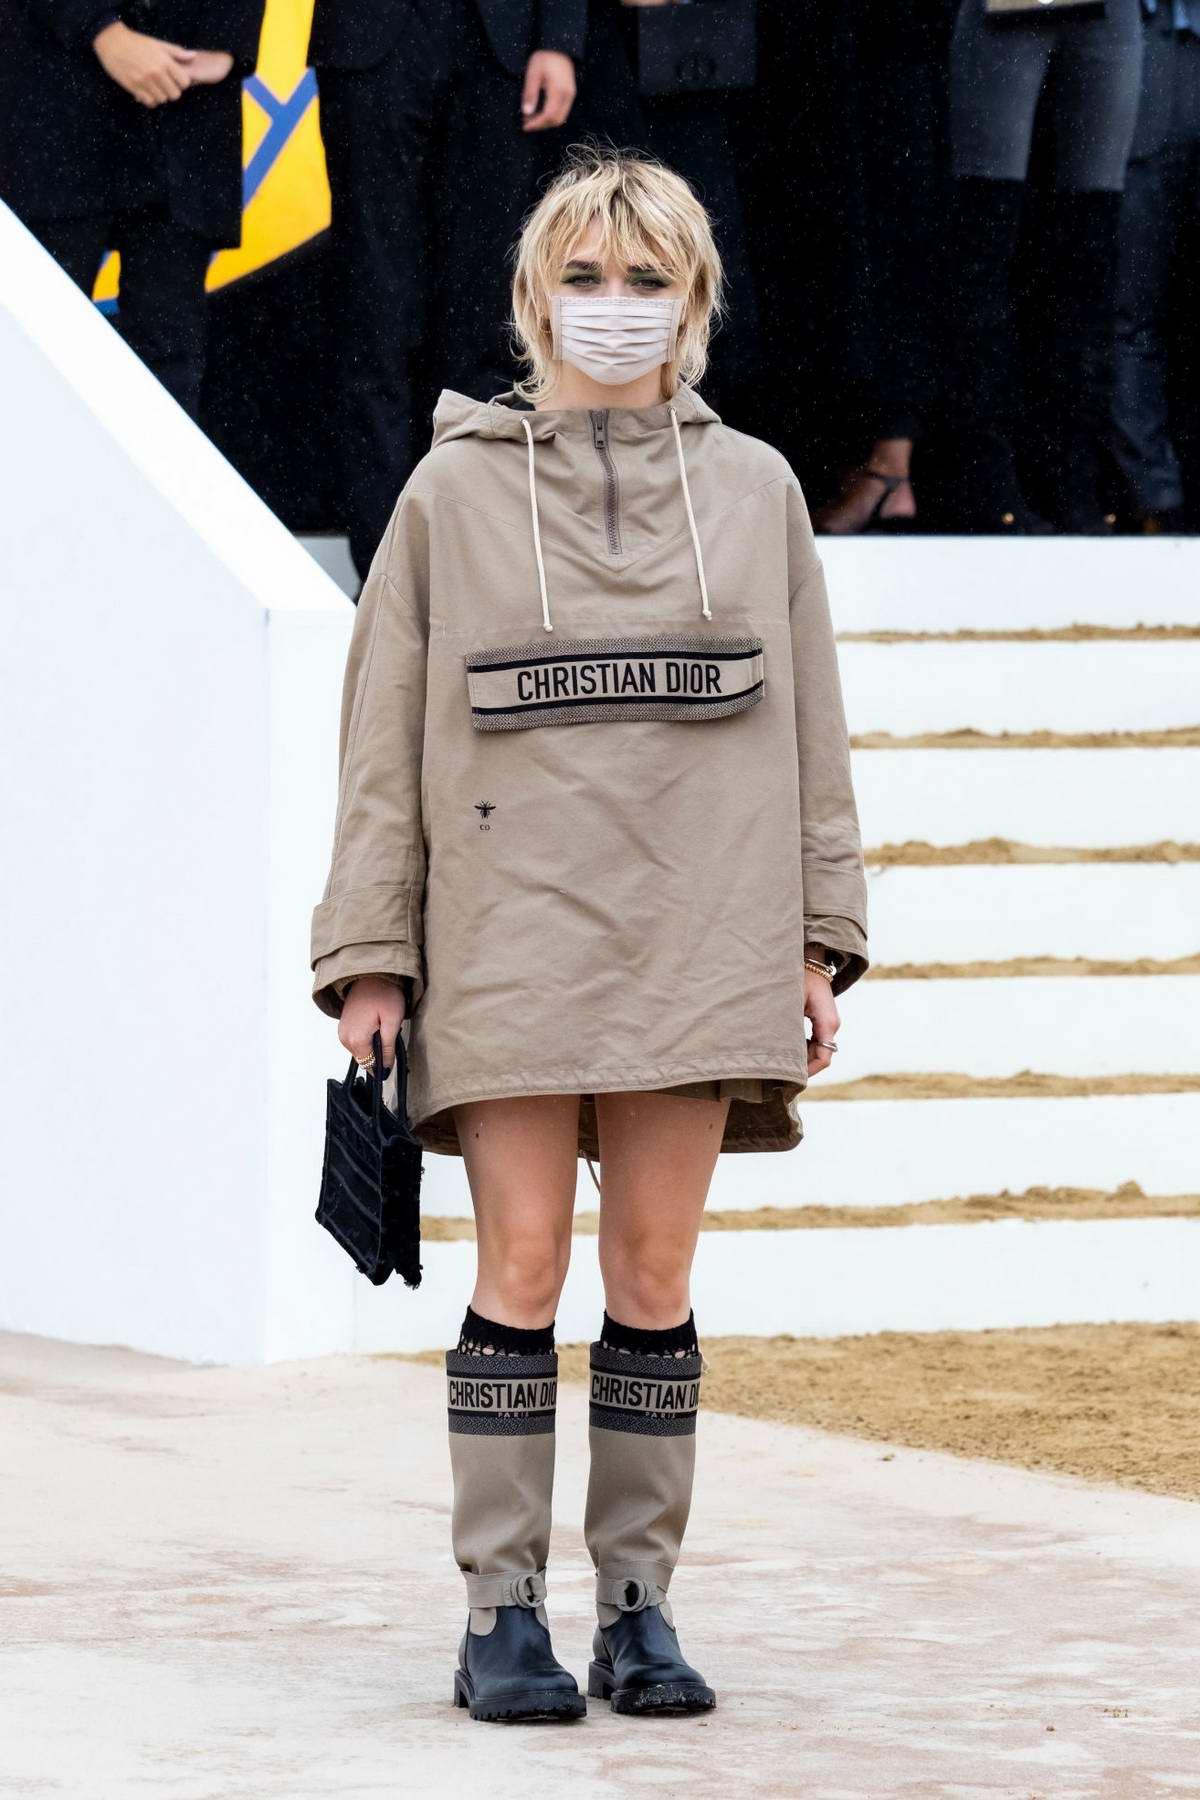 Maisie Williams attends the Dior Womenswear Spring-Summer 2021 show during Paris Fashion Week in Paris, France